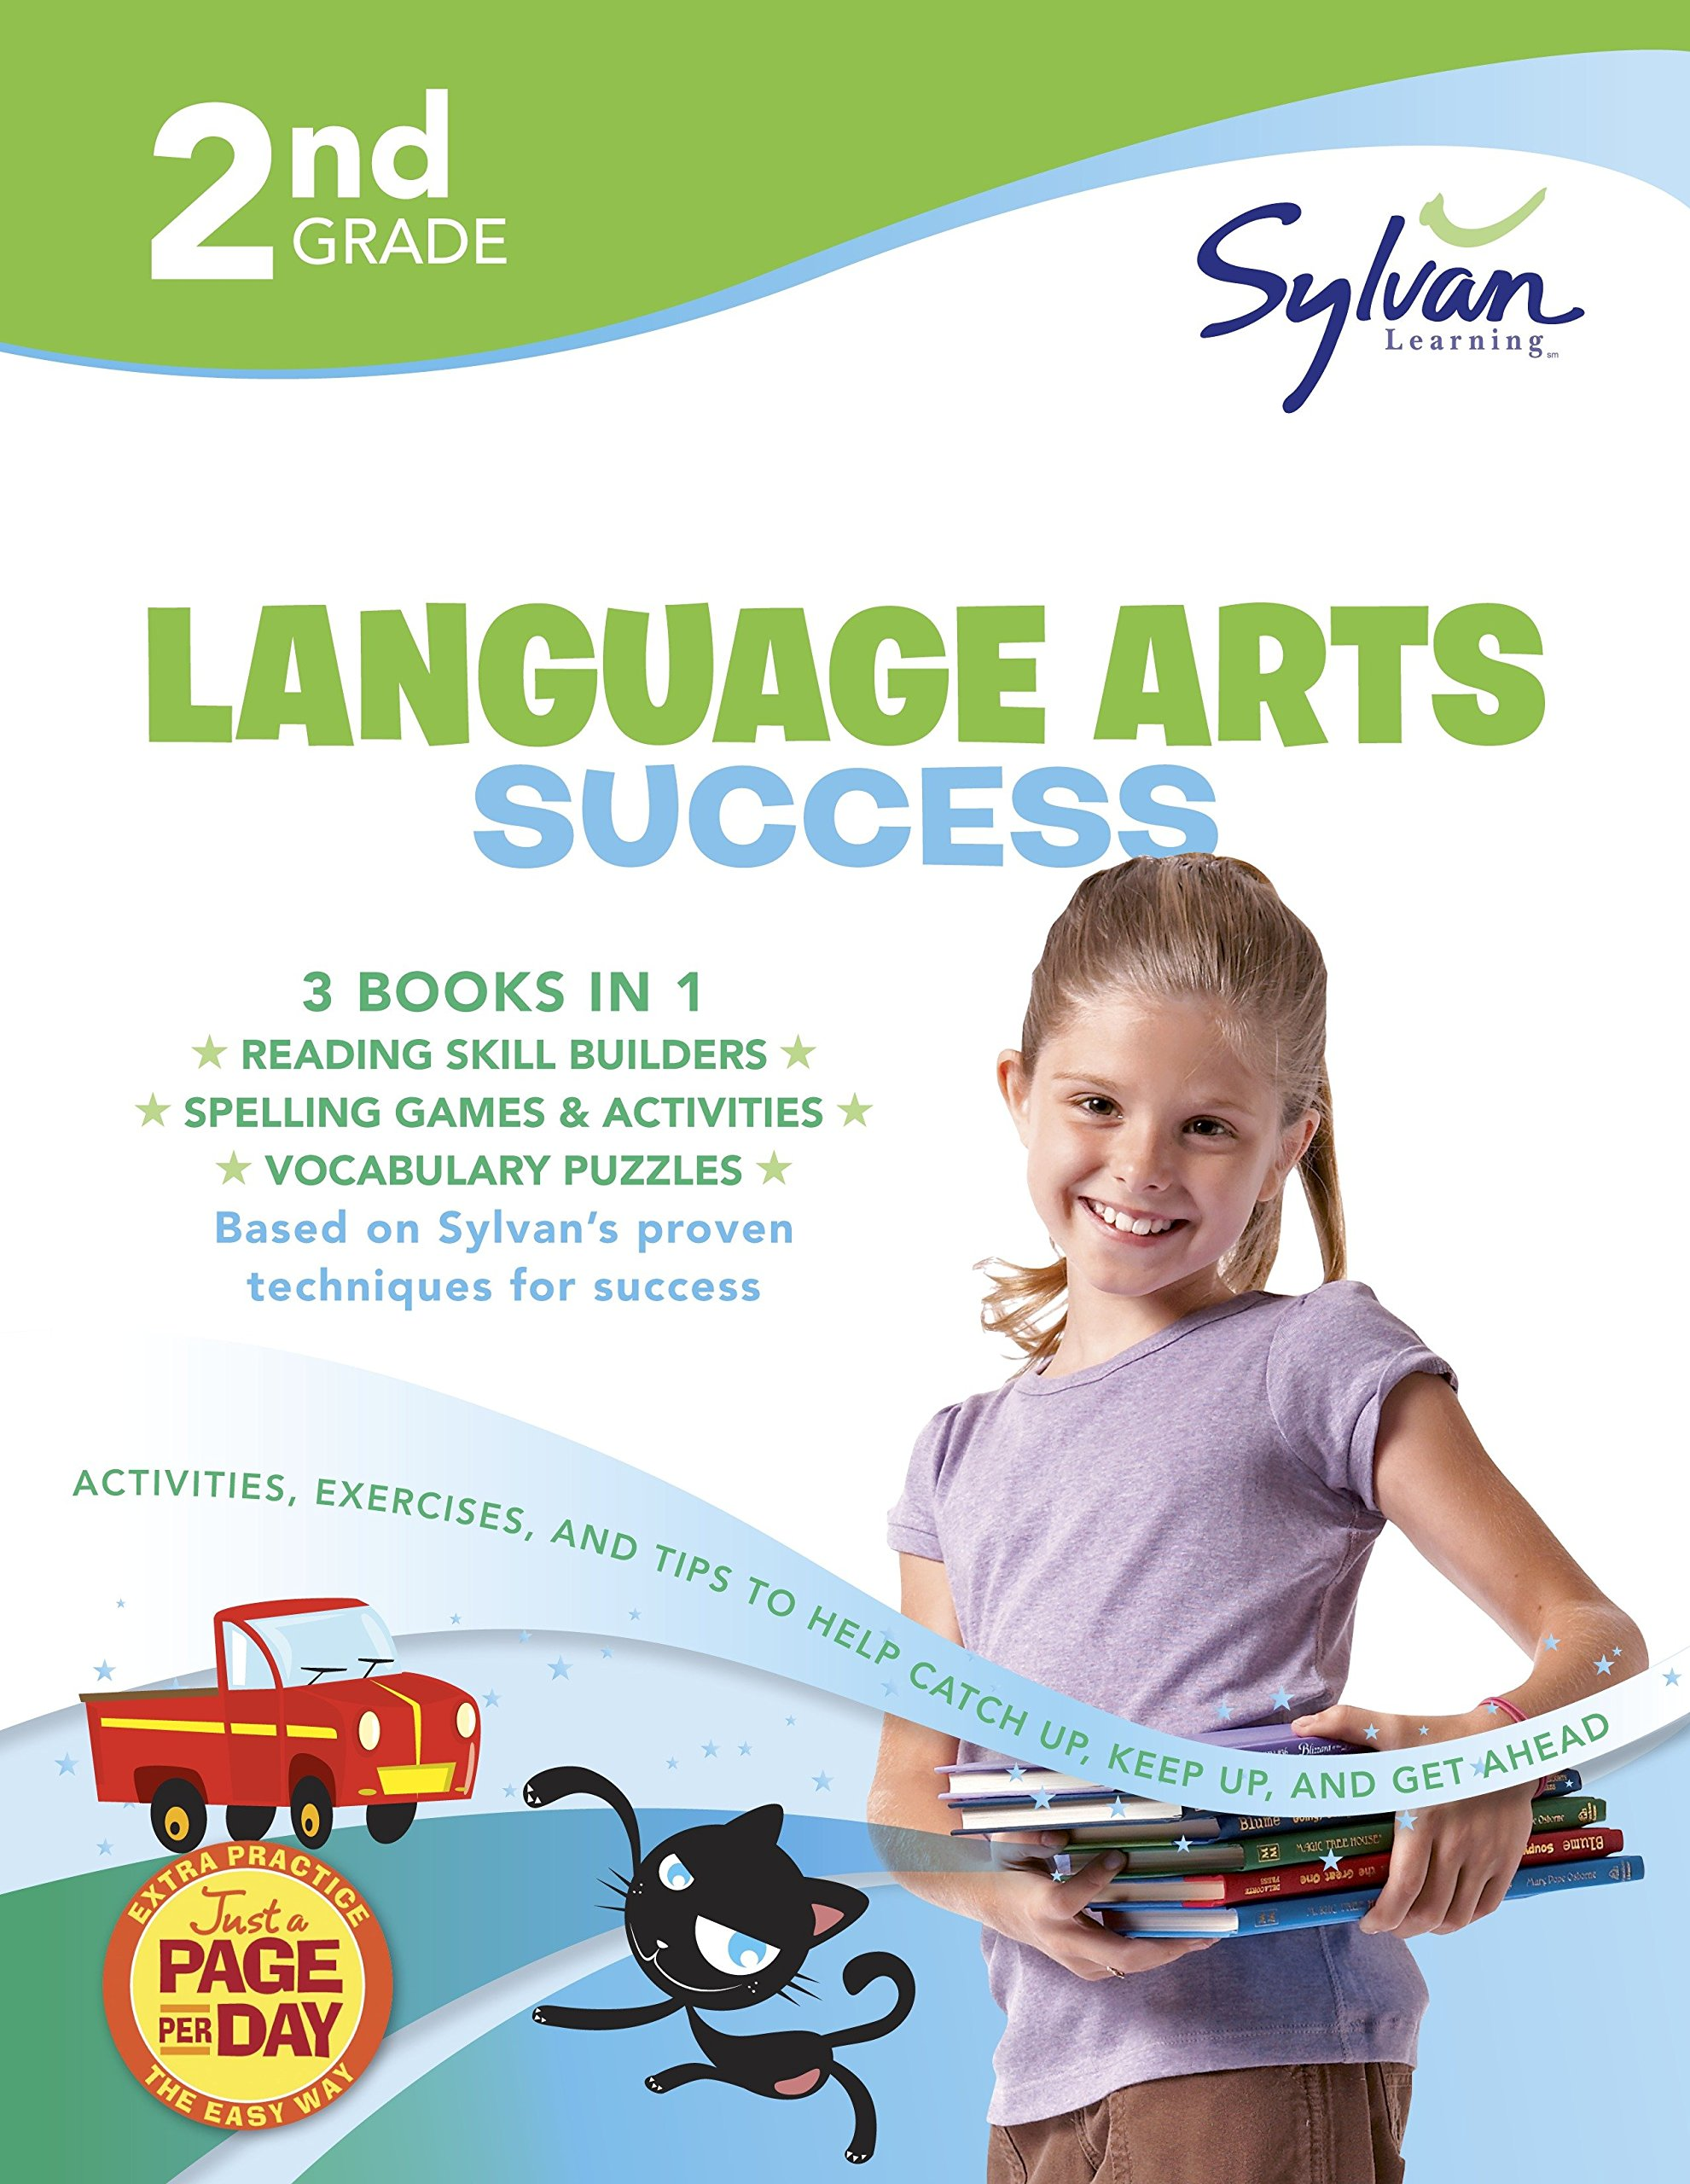 2nd Grade Language Arts Success product image